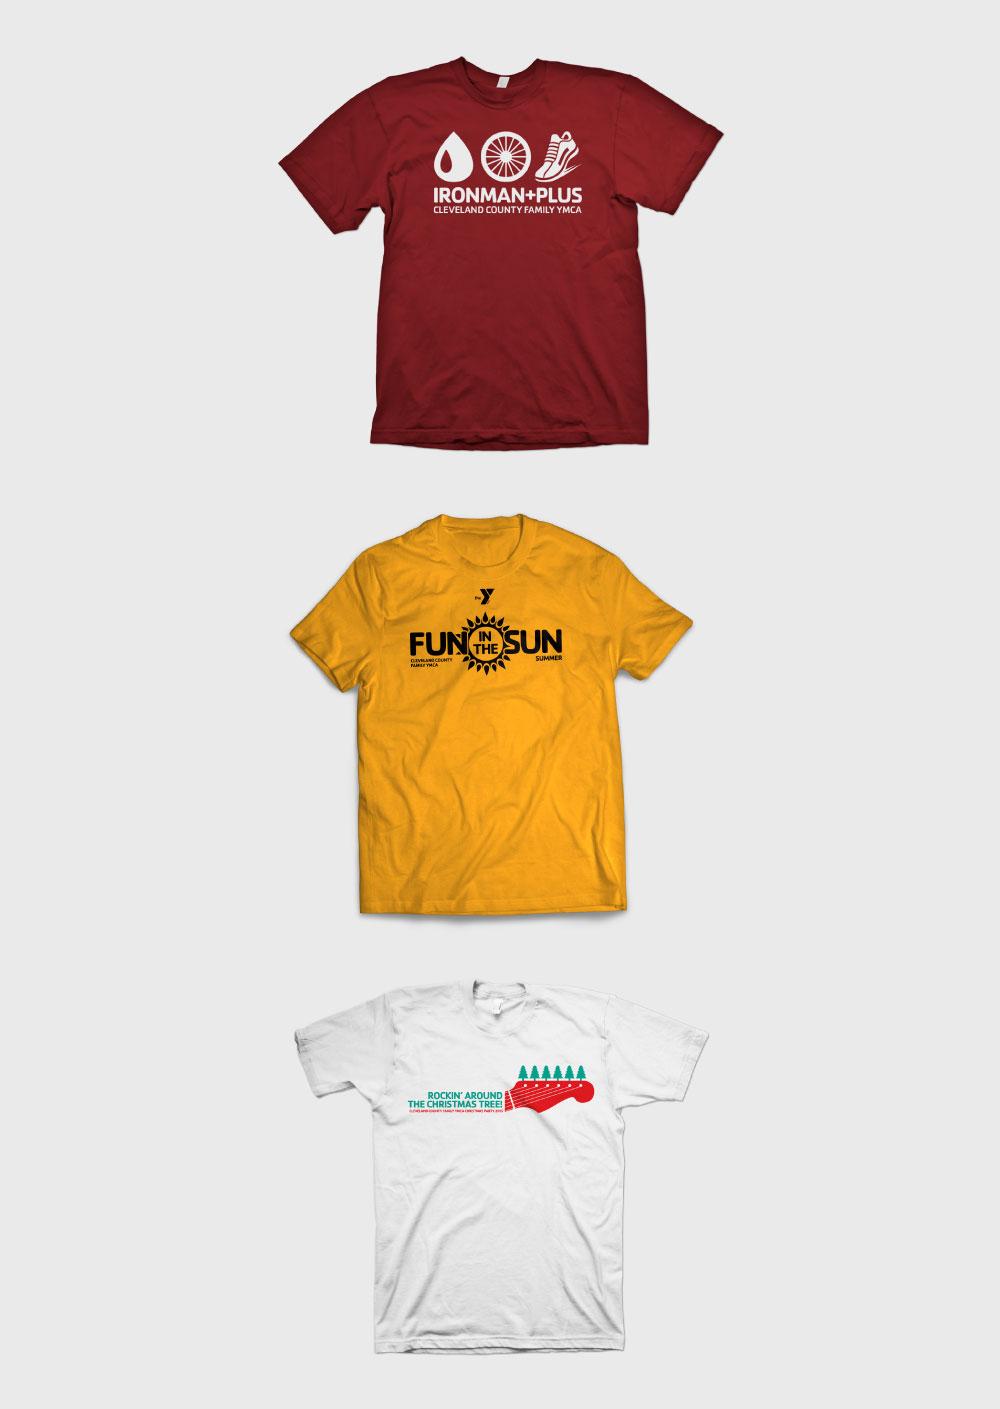 CCFYMCA Event T-shirt Designs